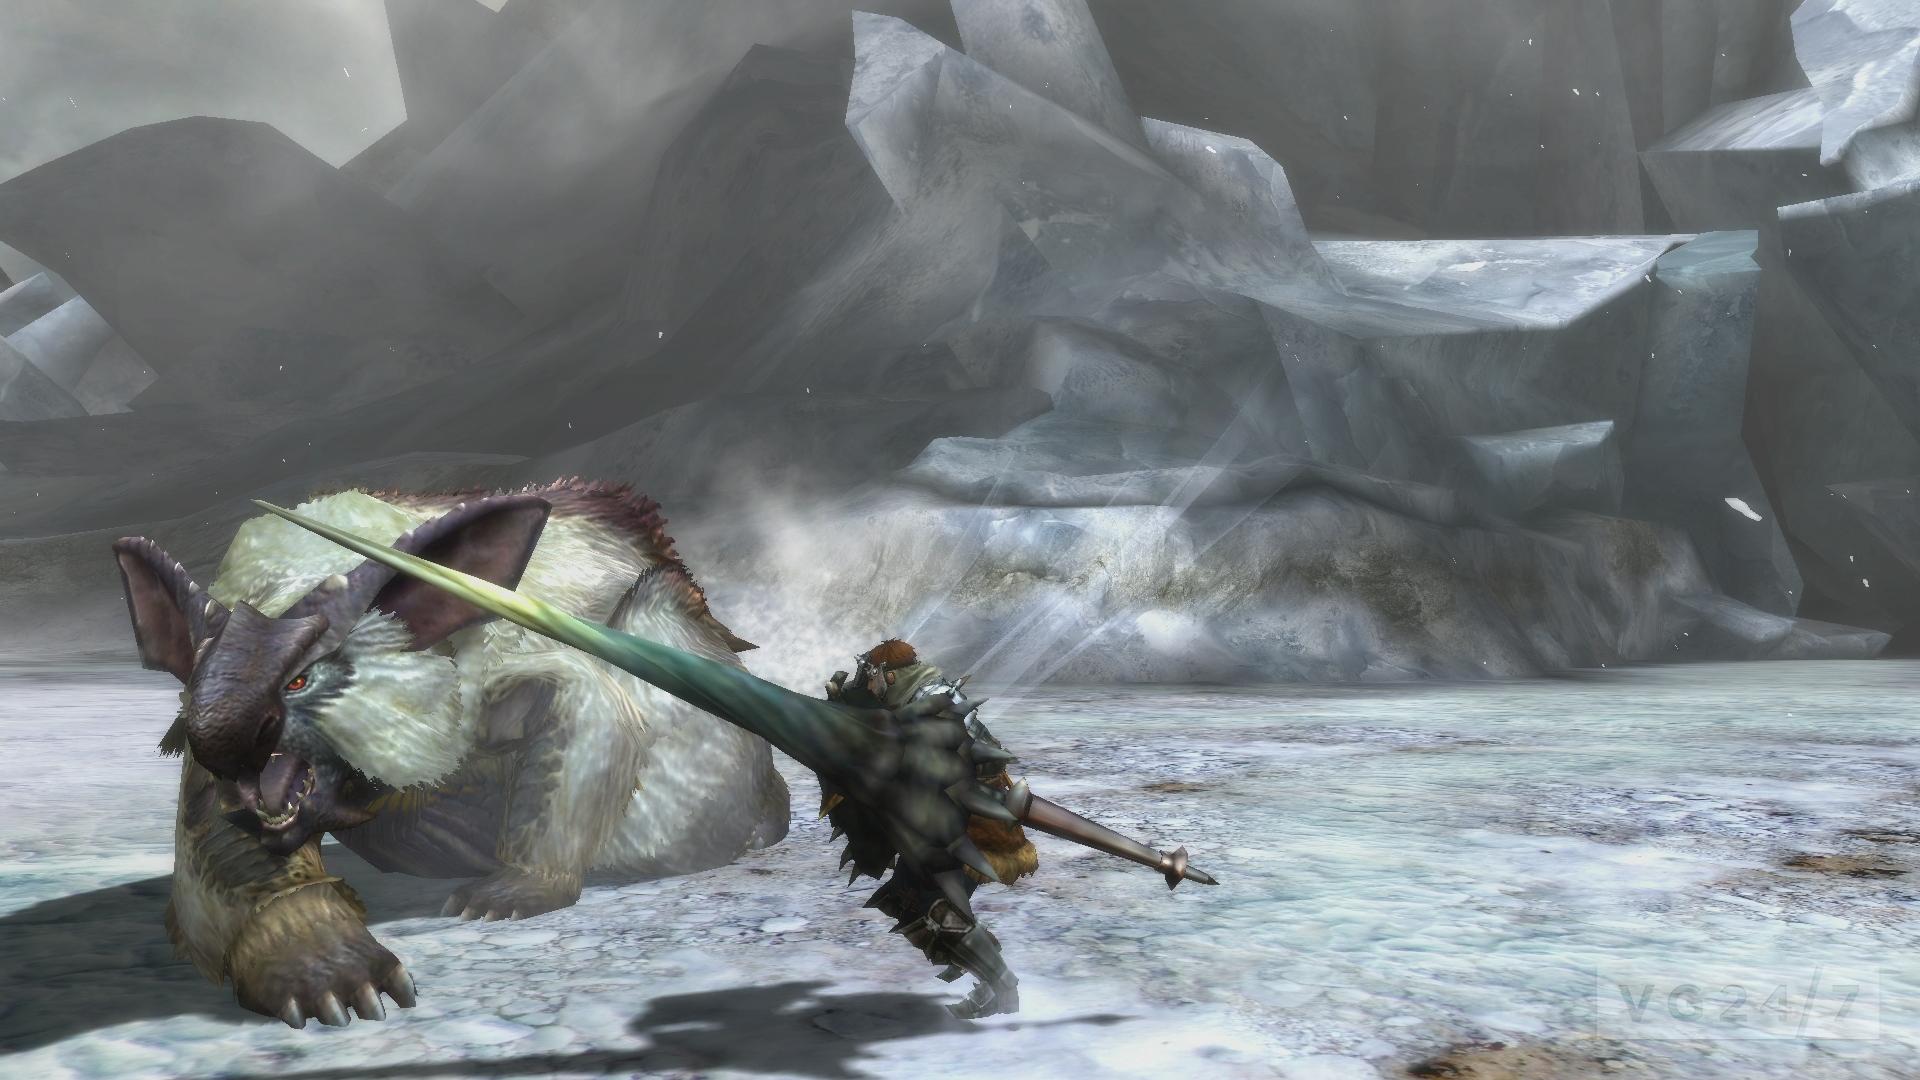 Monster hunter ultimate s new enemies include volvidon